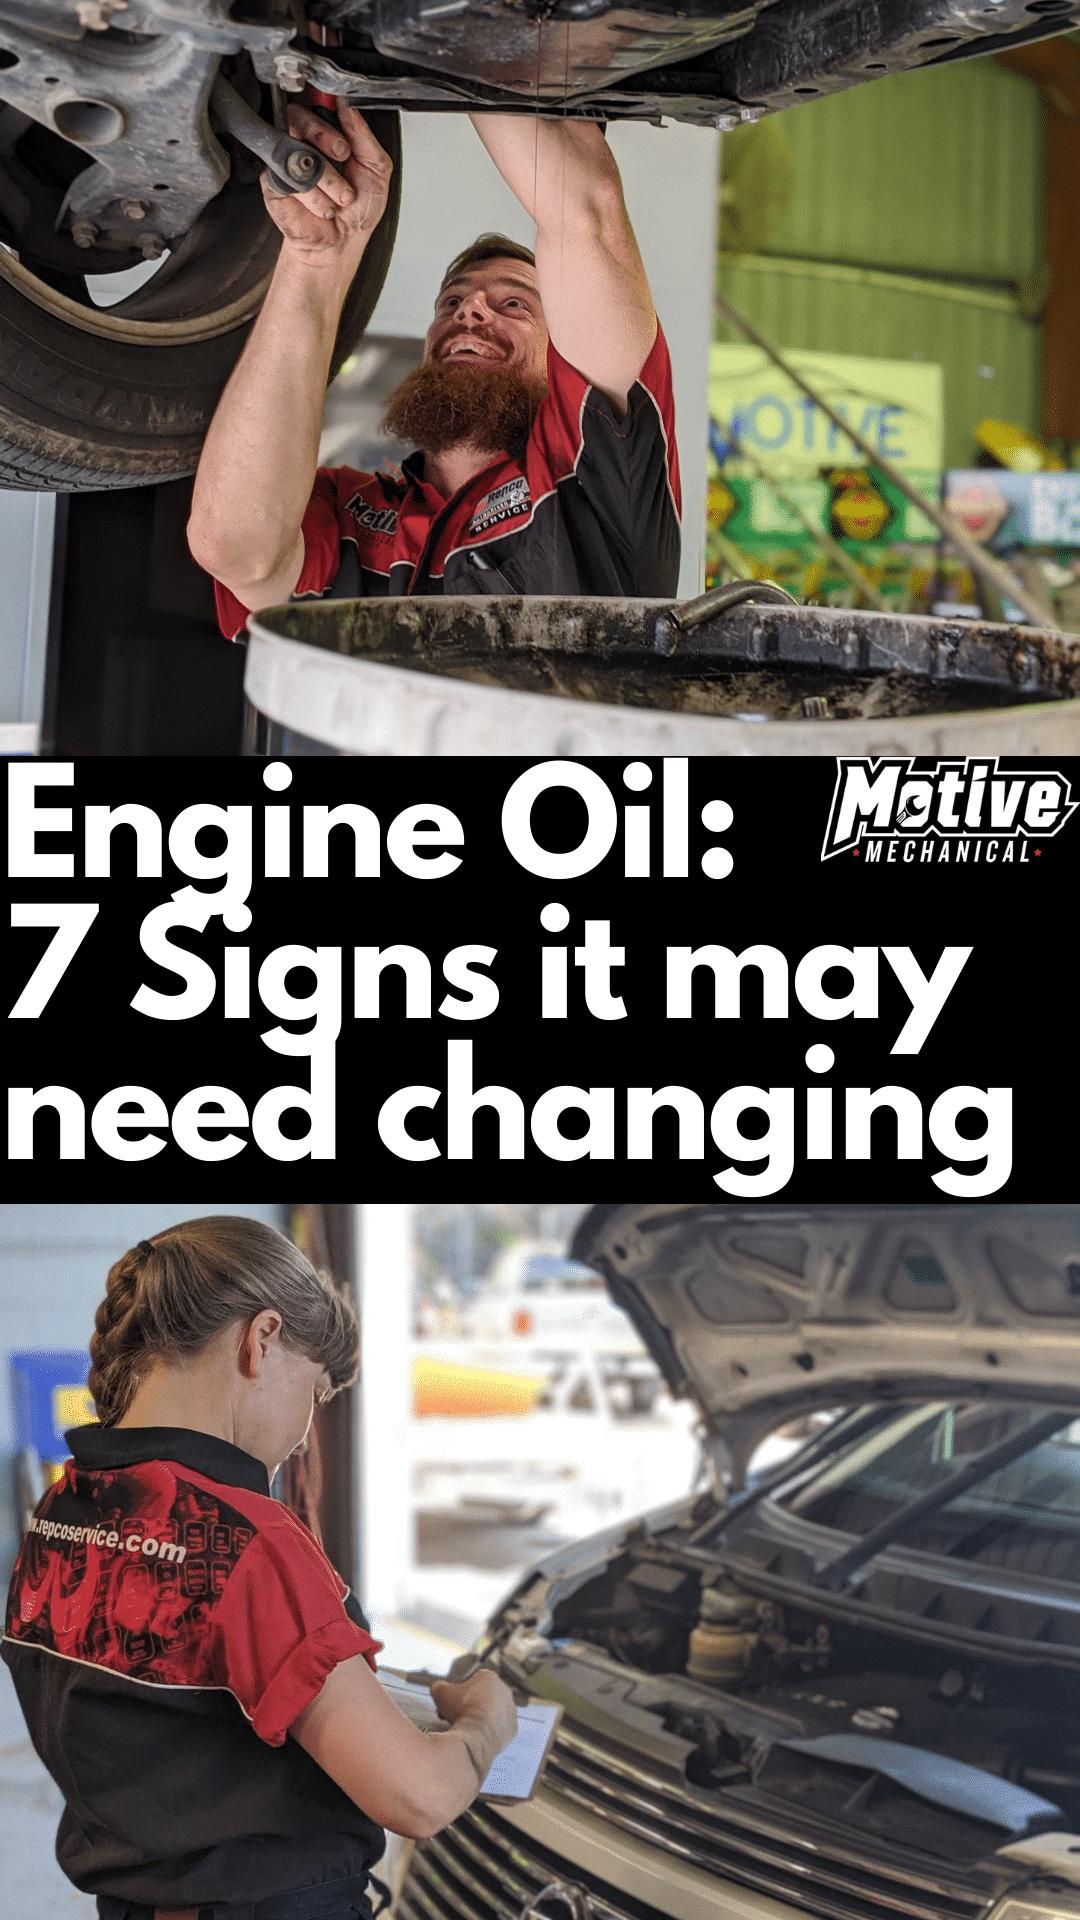 car-engine-oil-change-motive-mechanical